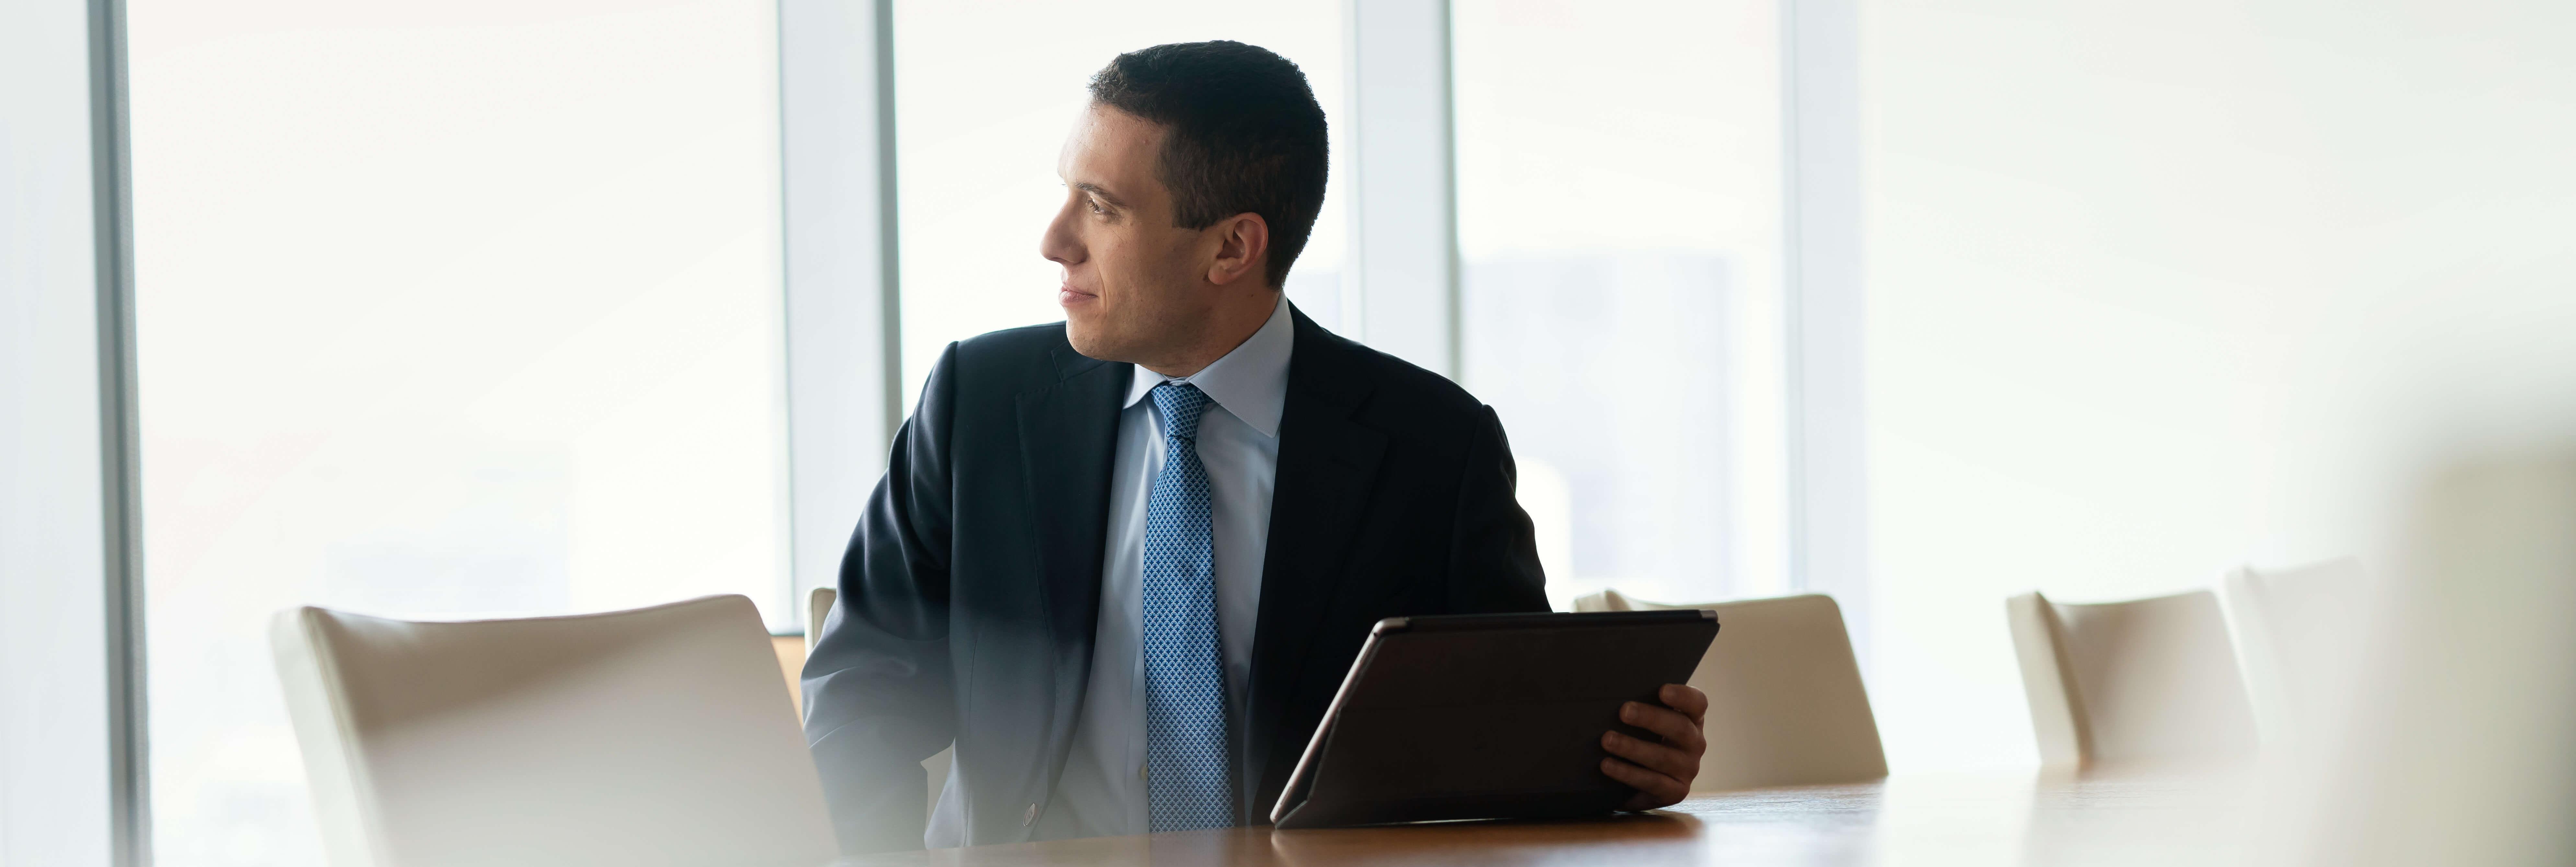 rra-insights-executive-leadership.jpg